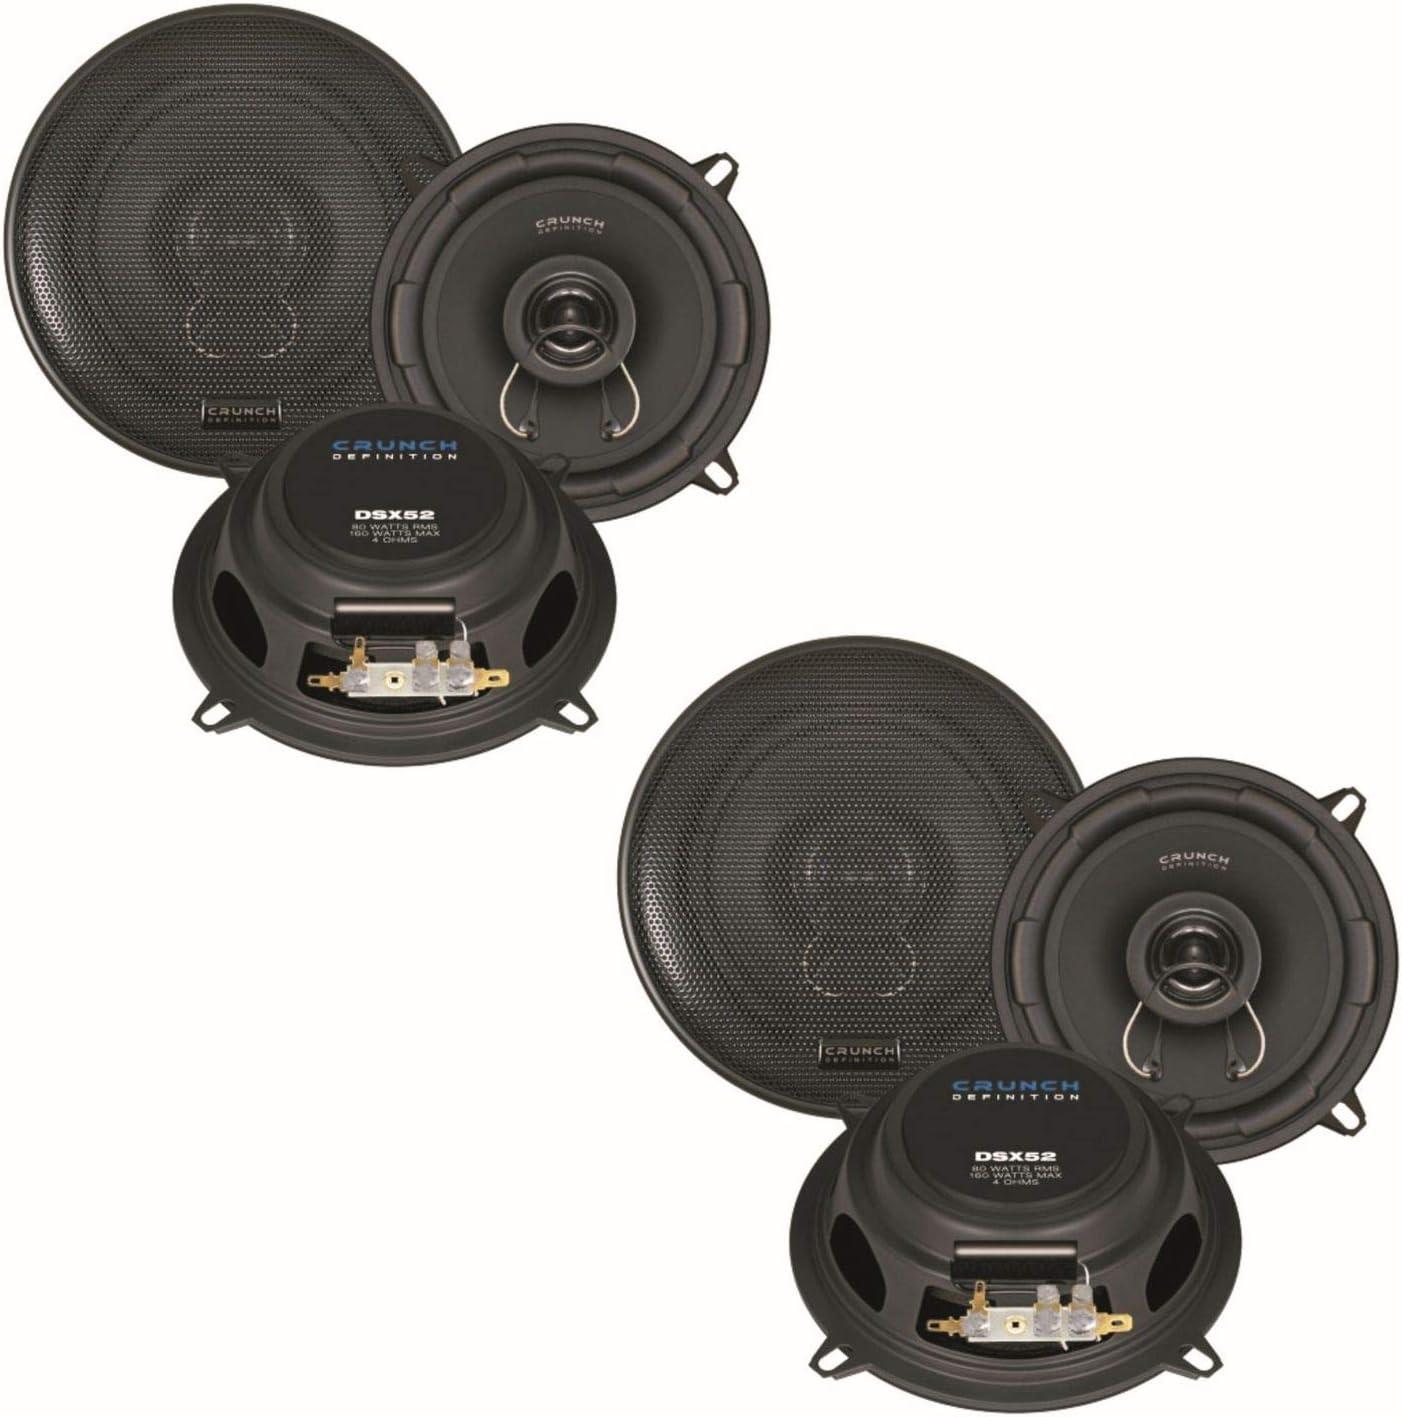 Crunch Dsx52 2 Wege Koaxial Lautsprecher System Boxen Elektronik